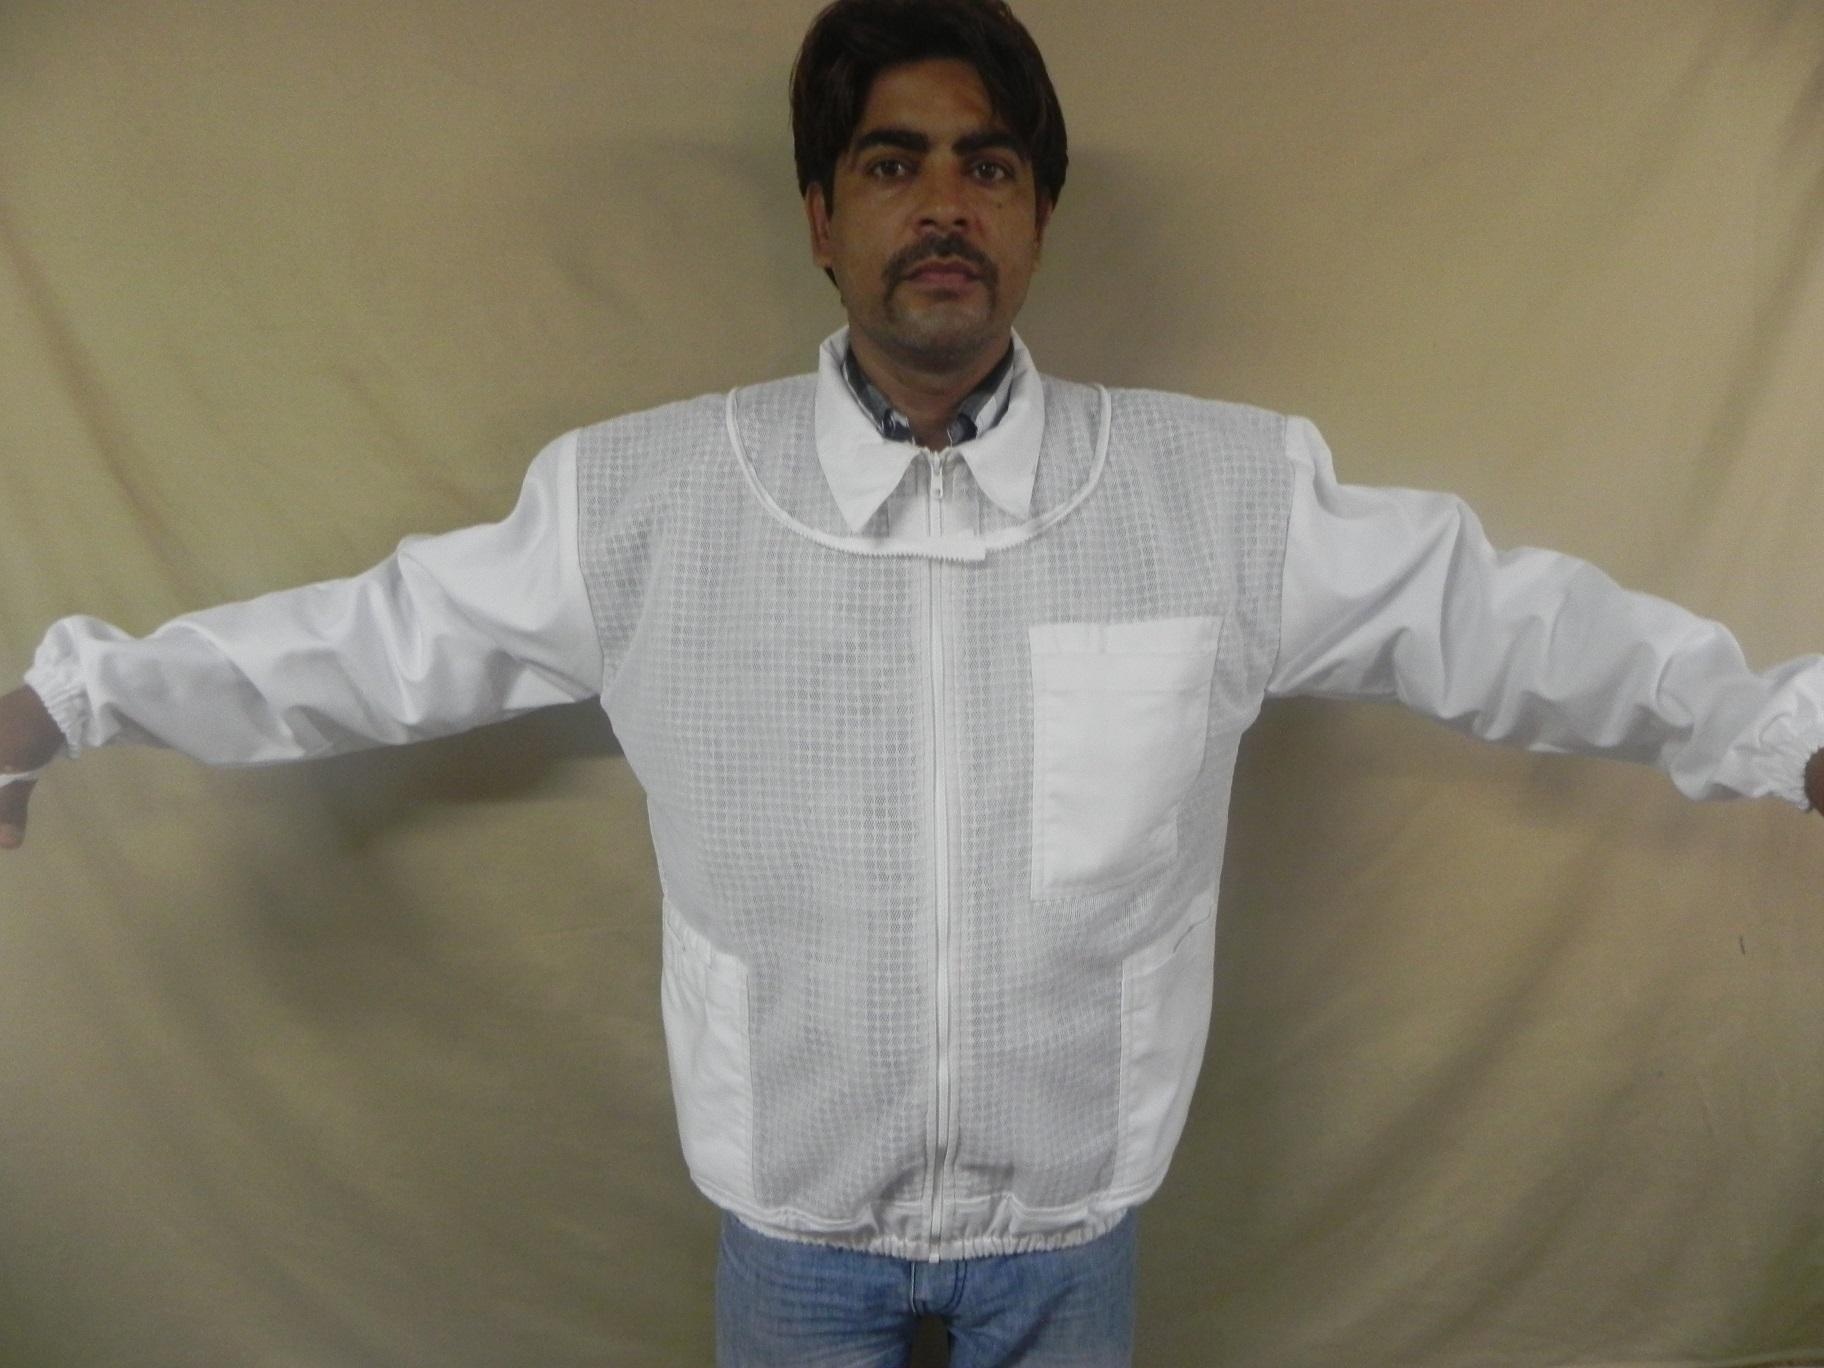 Pro ventilated jacket